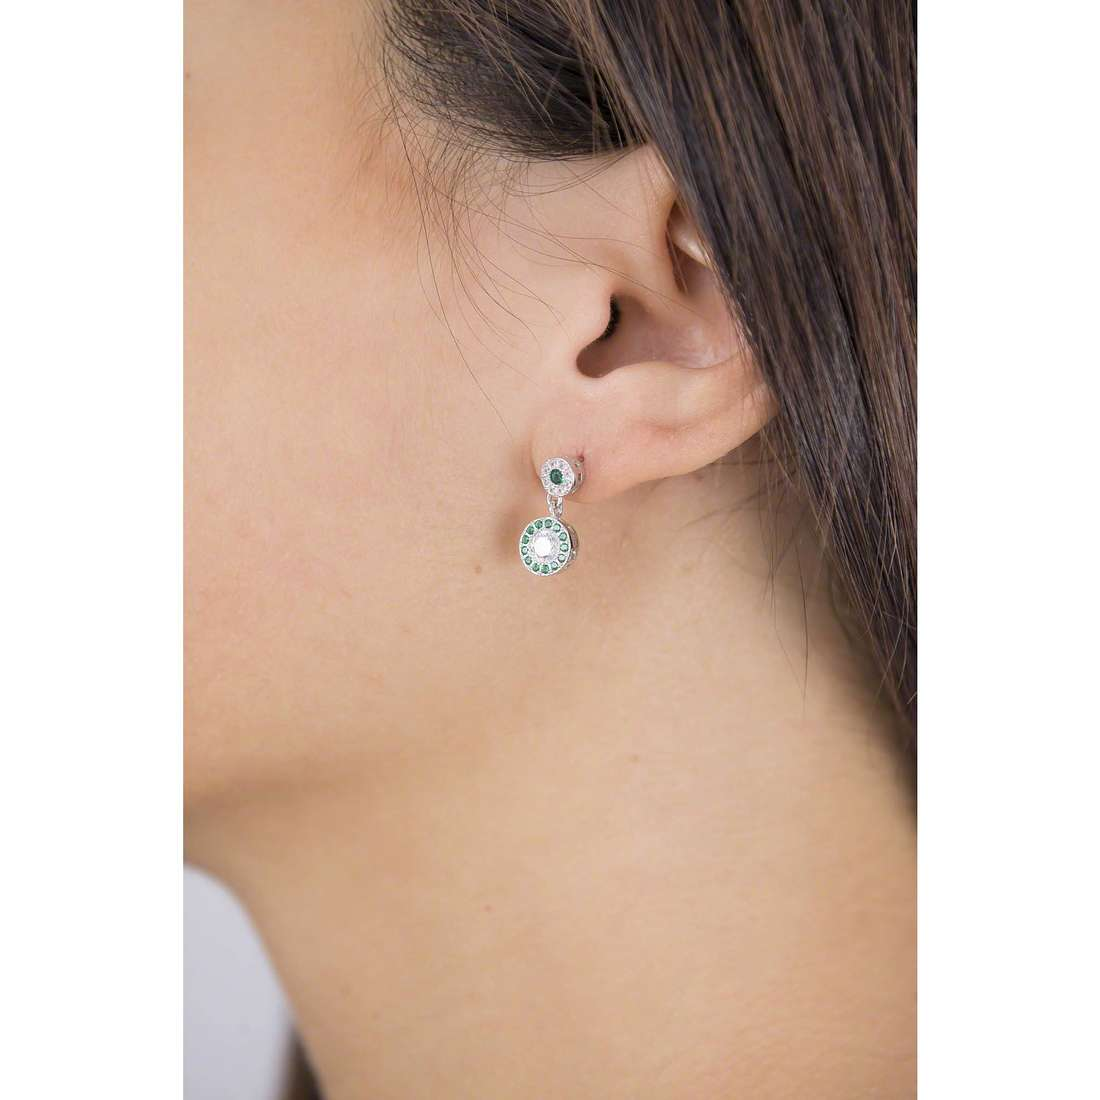 GioiaPura orecchini donna GPSRSOR2303-VE indosso